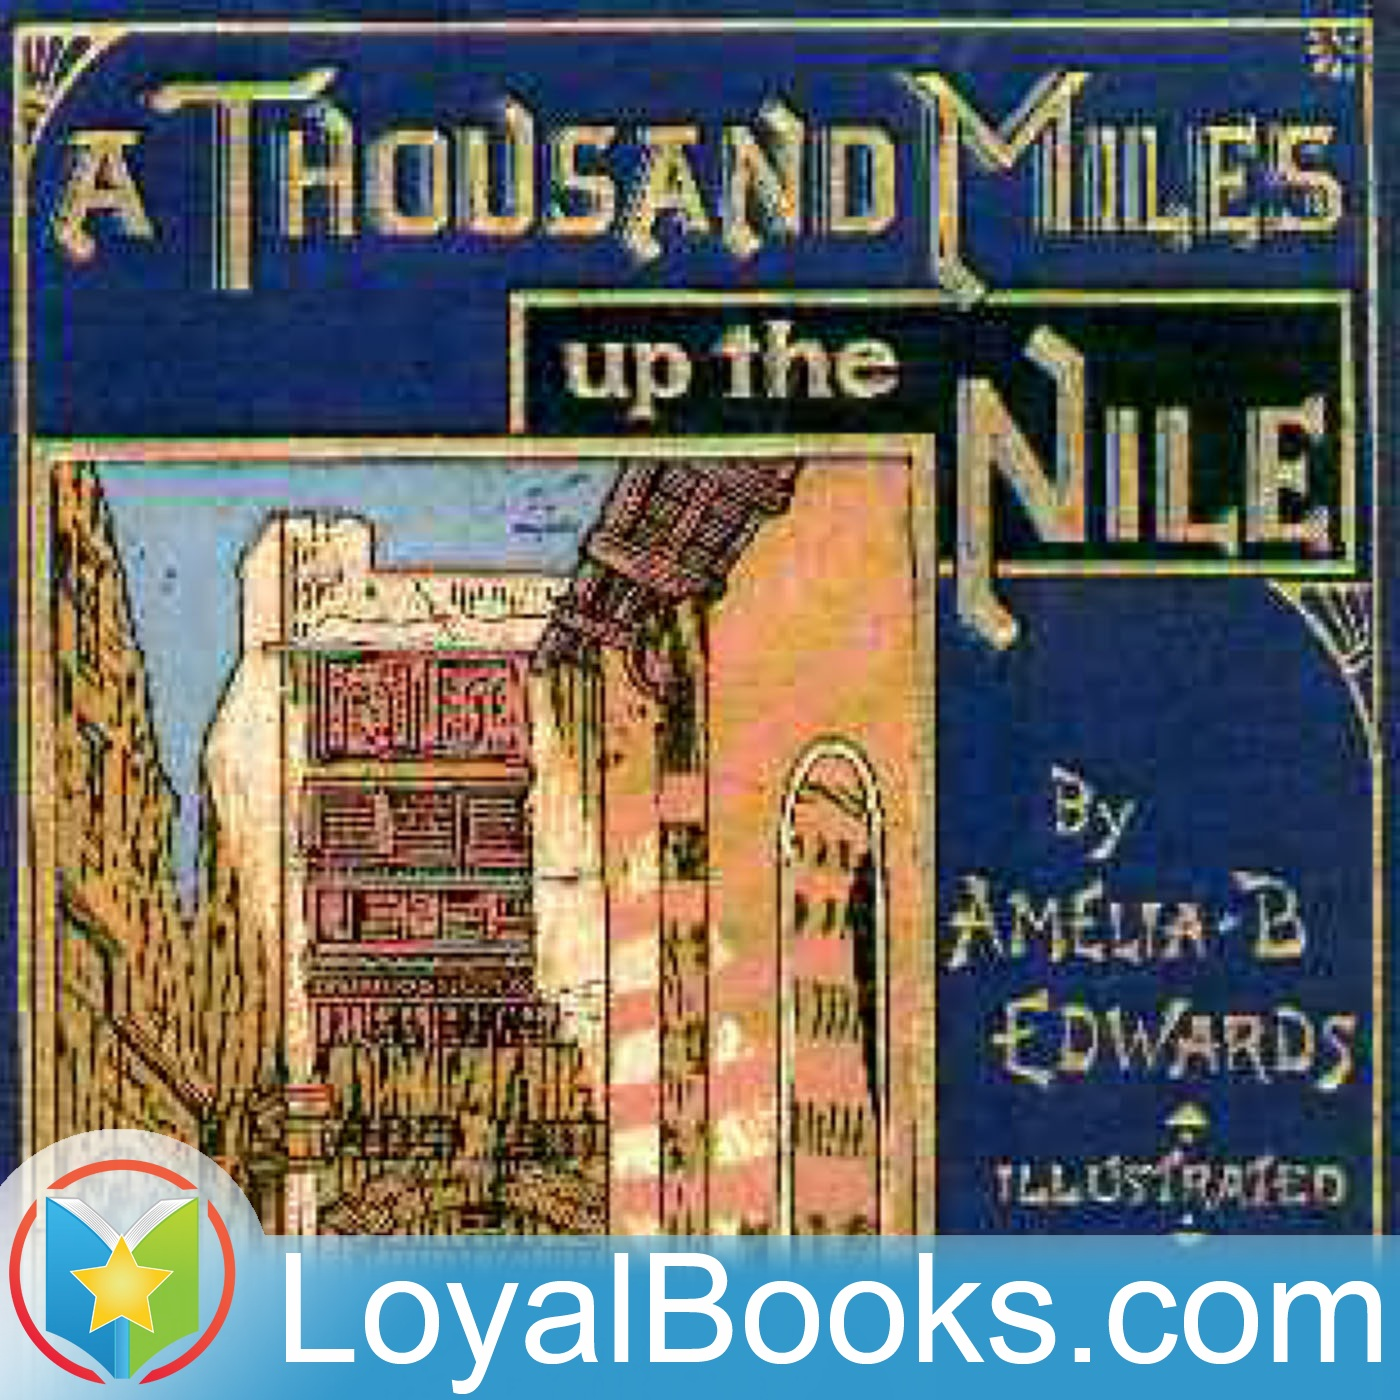 A Thousand Miles up the Nile by Amelia B. Edwards  